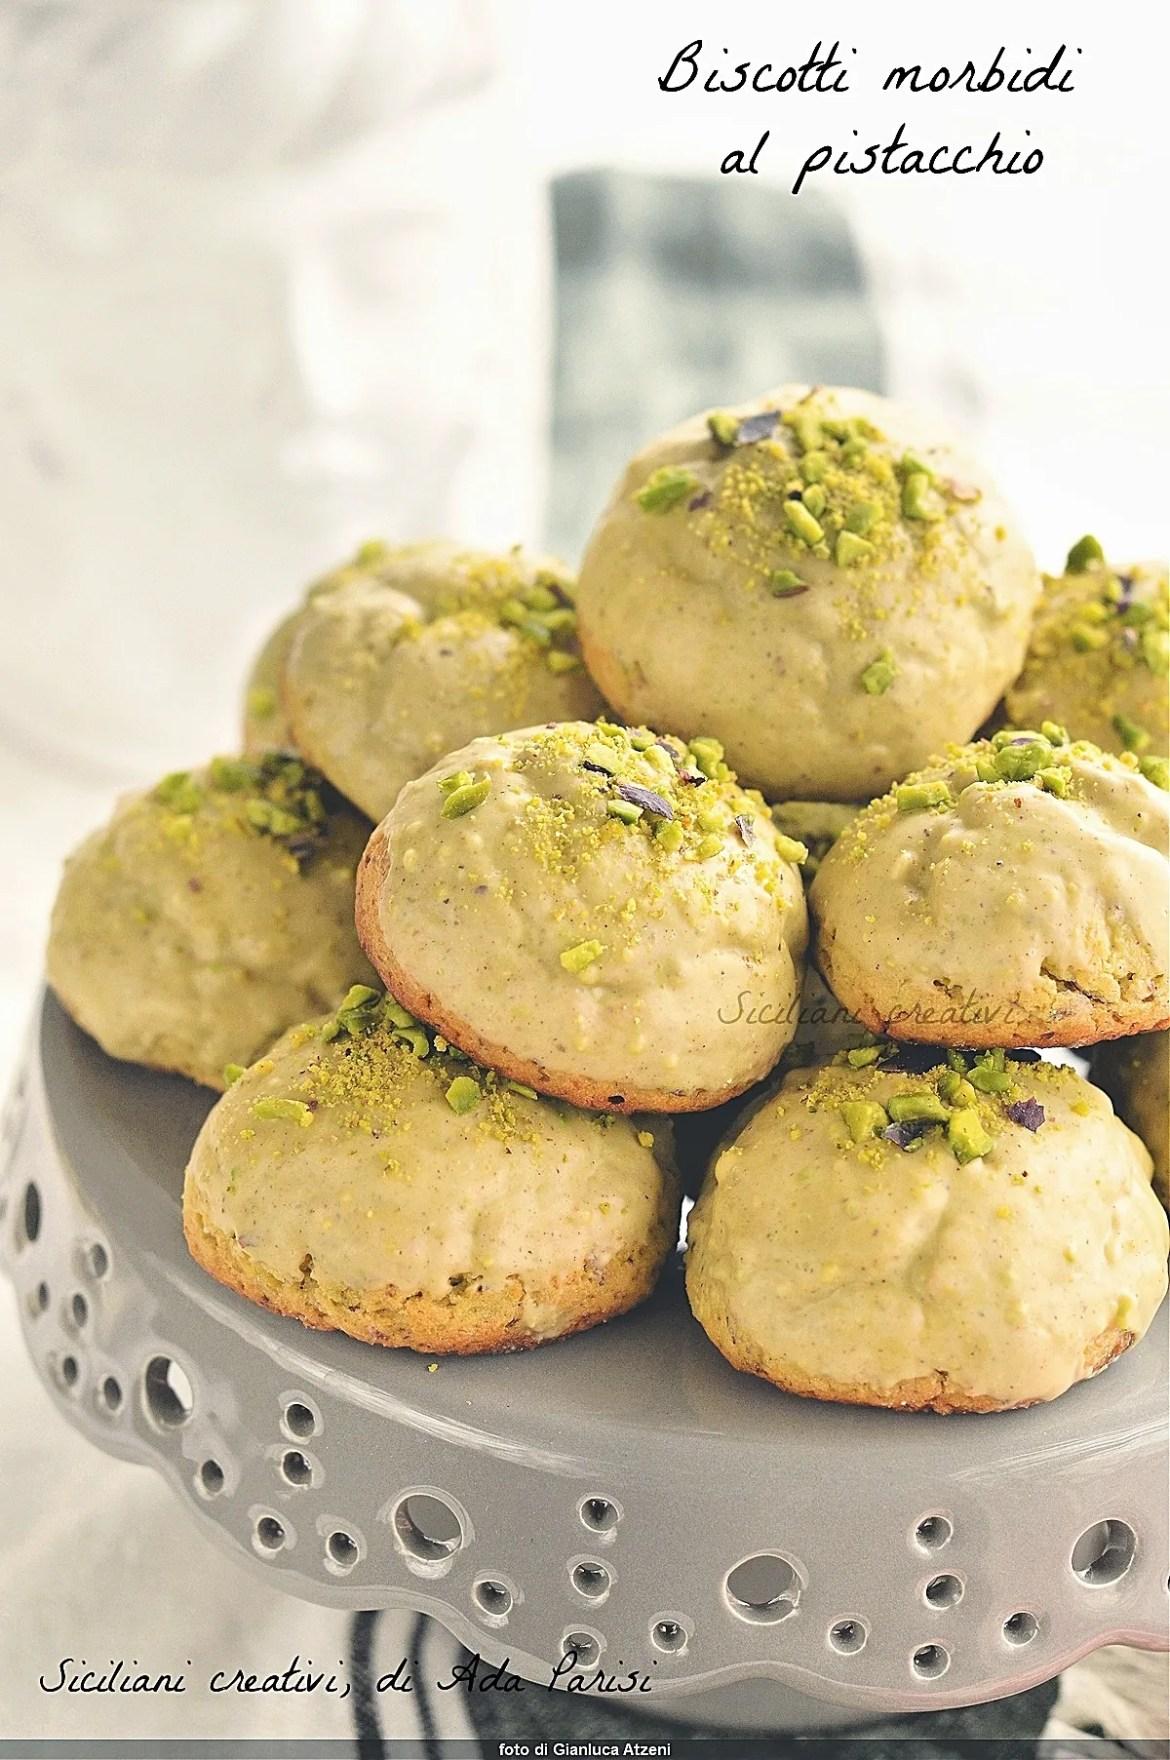 Soft pistachio biscuits